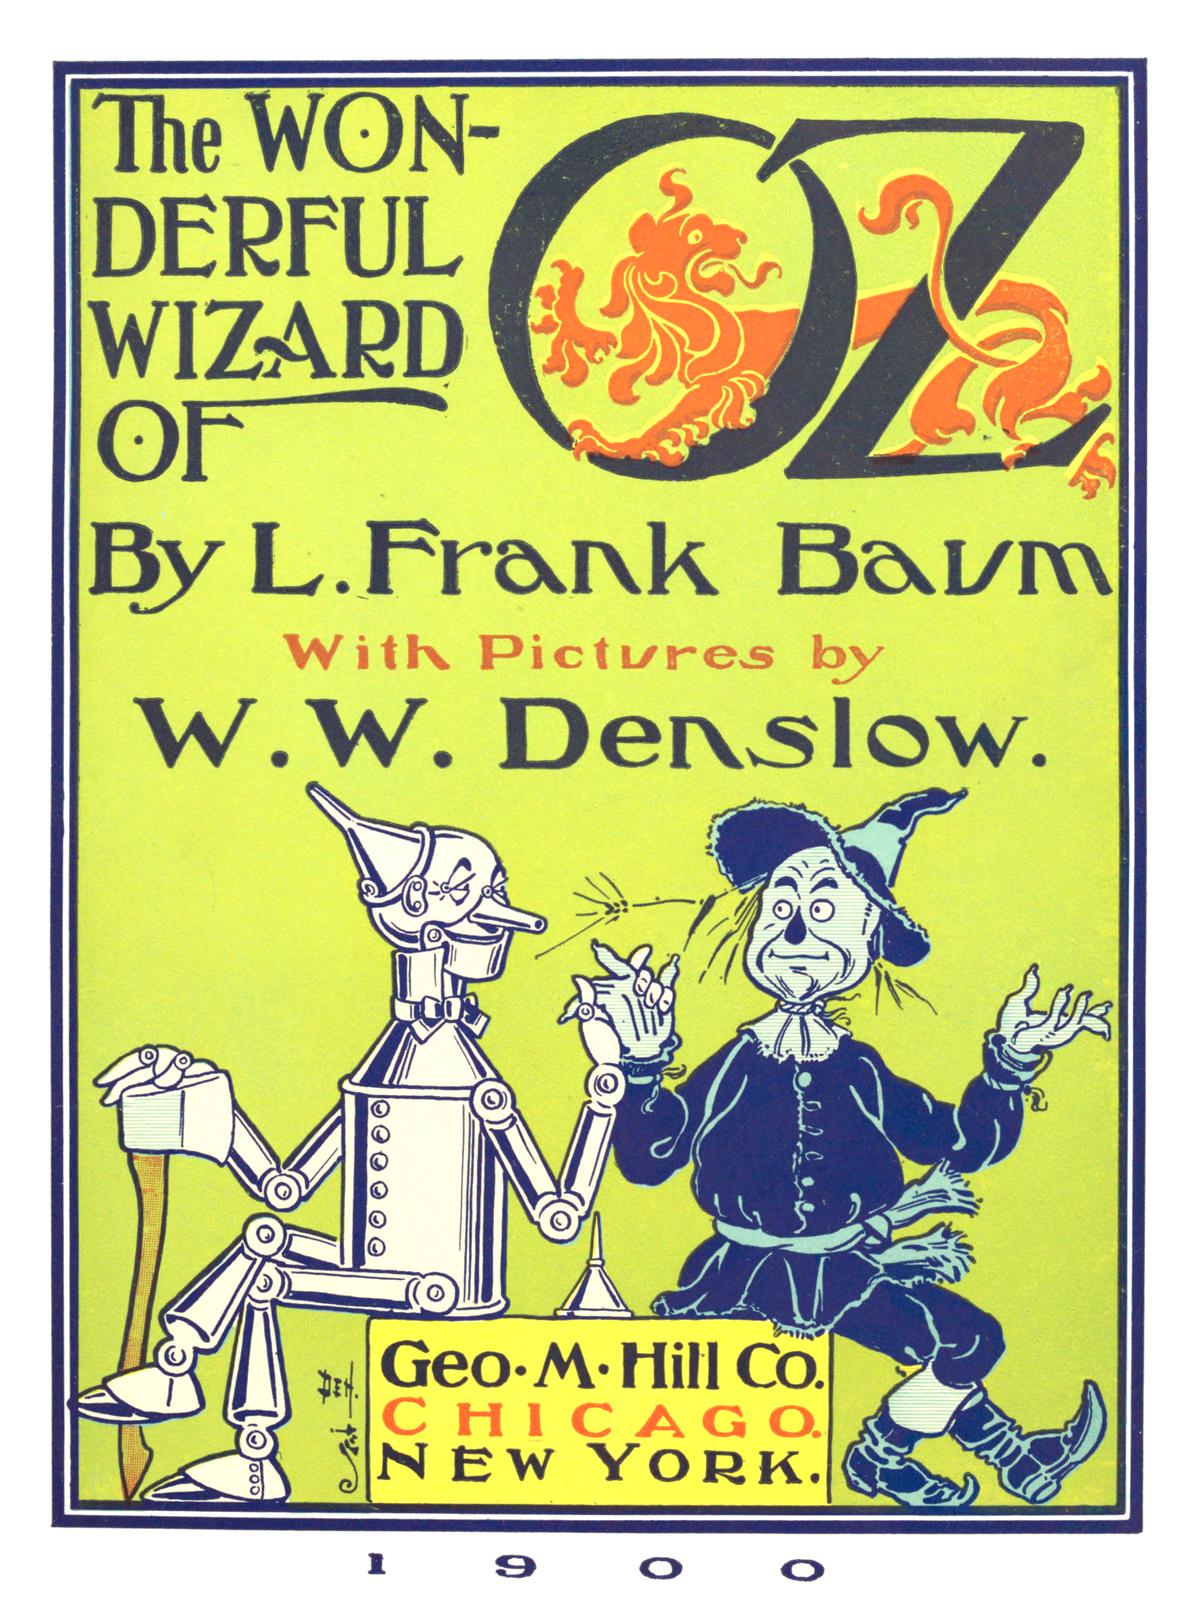 The Wonderful Wizard of Oz - Wikipedia